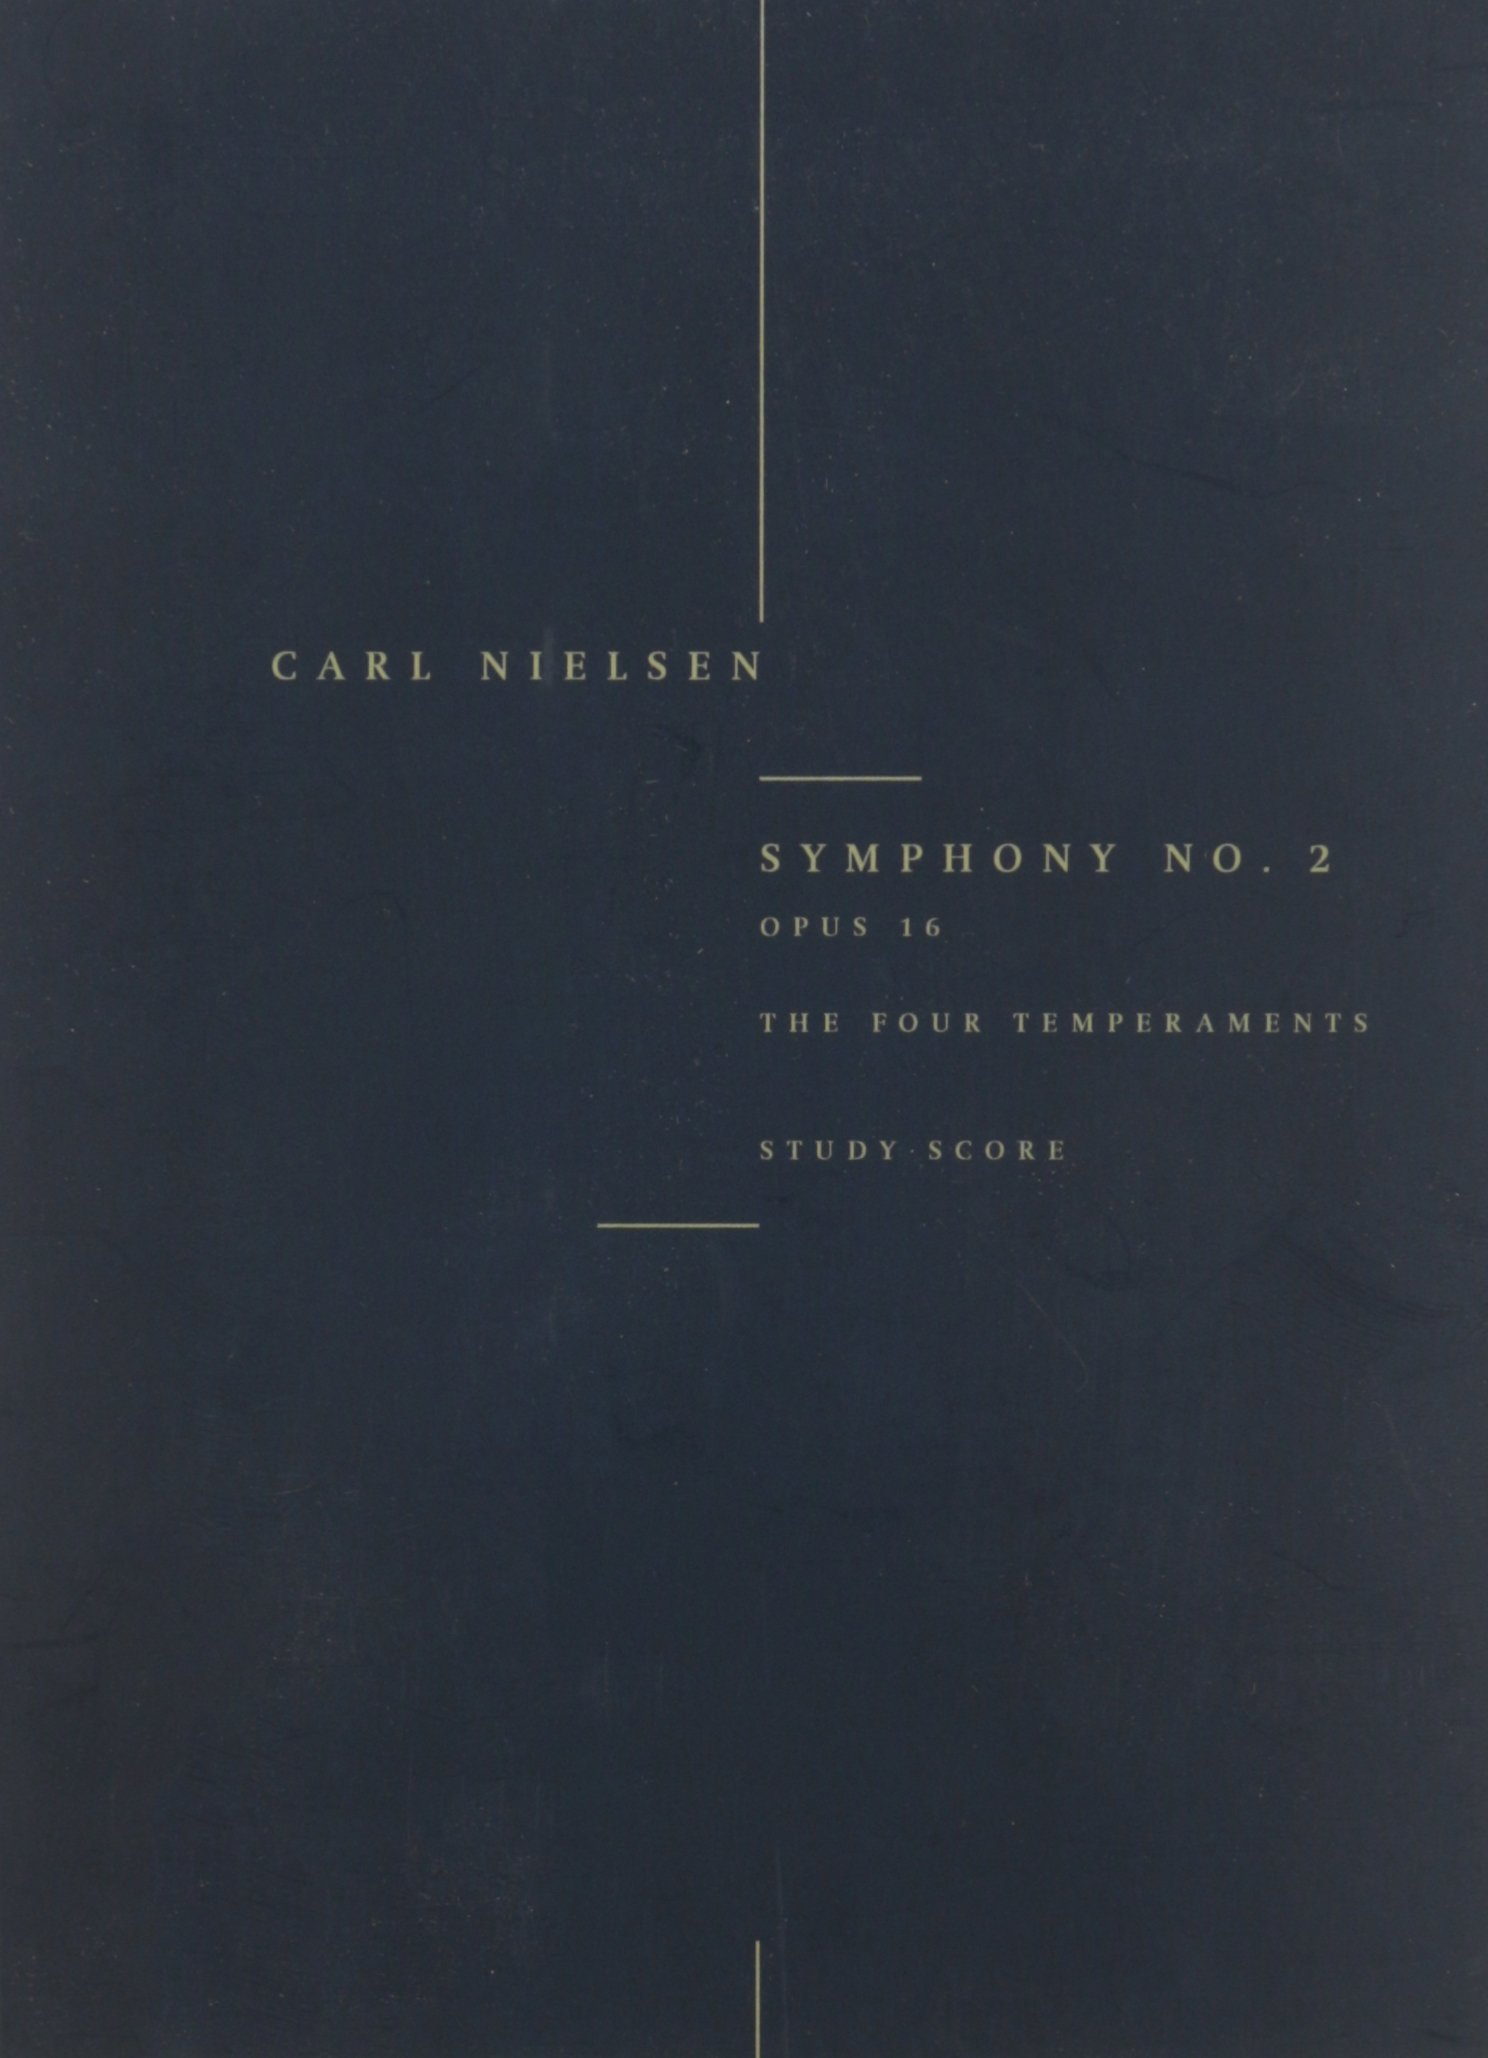 Symphony No. 2, Op. 16 'The Four Temperaments': Study Score PDF